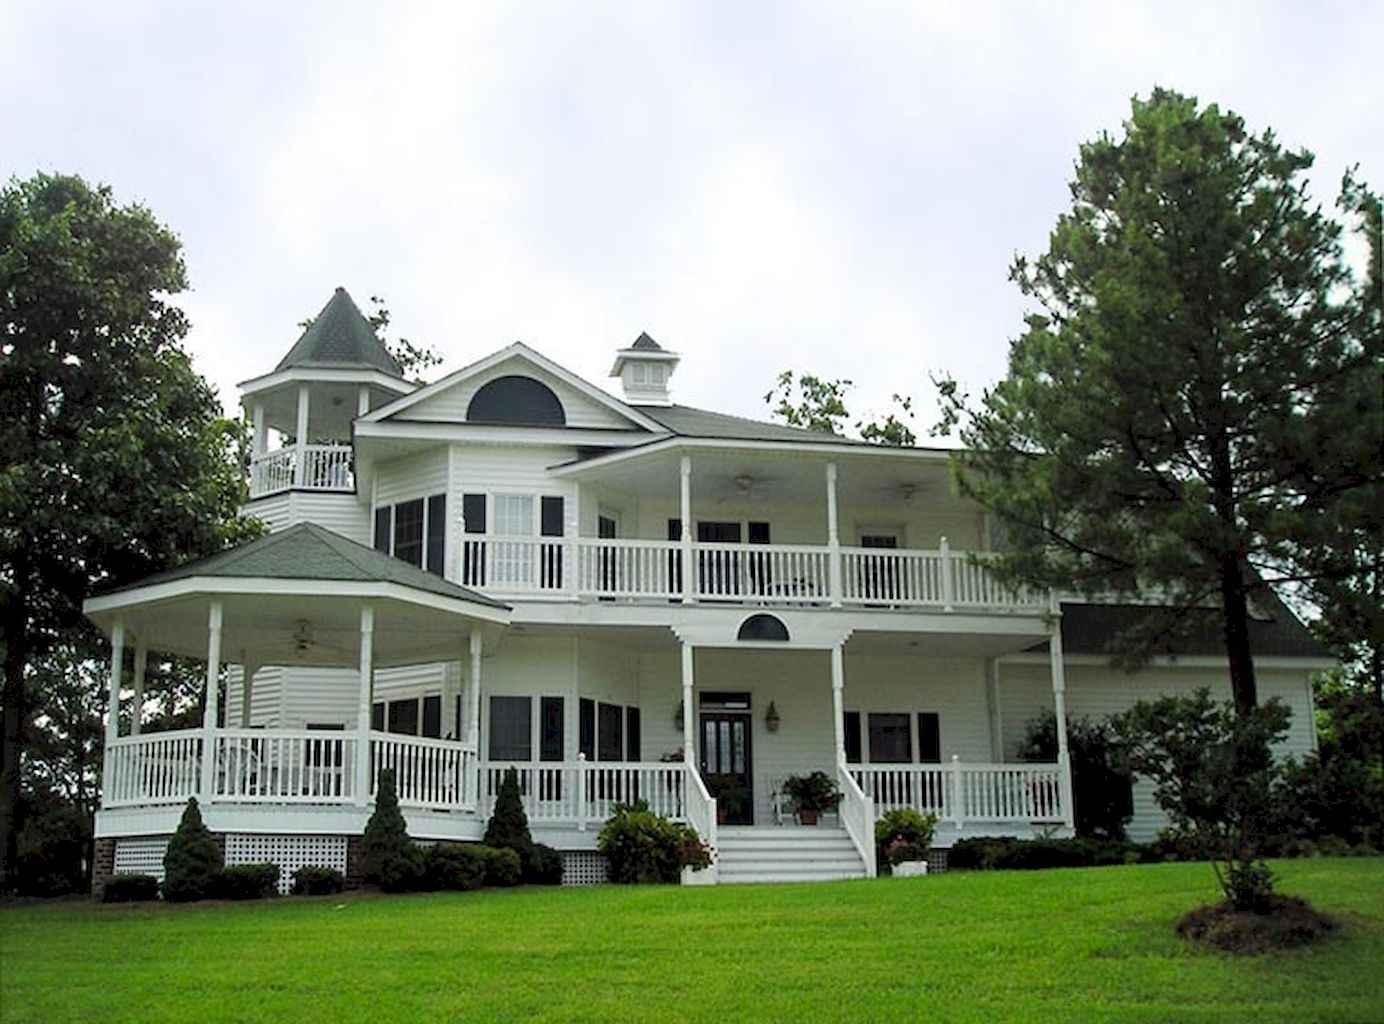 80 awesome victorian farmhouse plans design ideas (25)